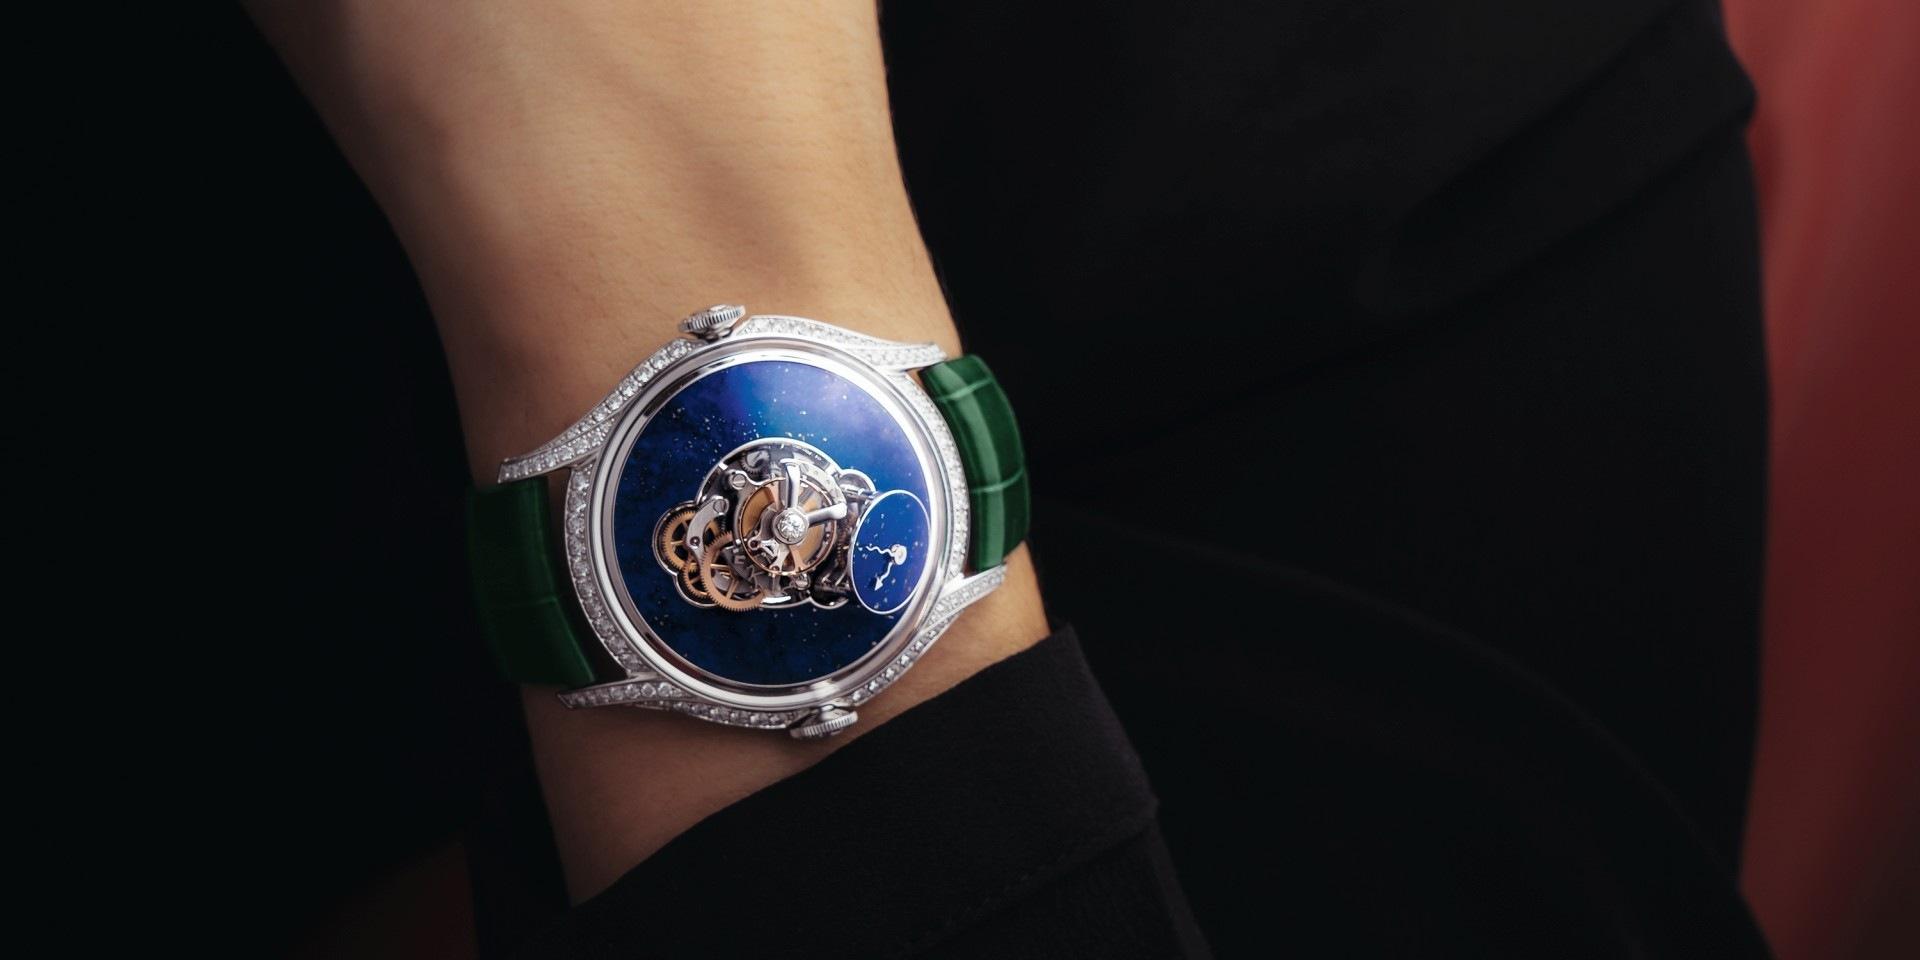 MB&F為女性量身打造的腕錶—Legacy Machine FlyingT 推出藍色青金石面盤款式